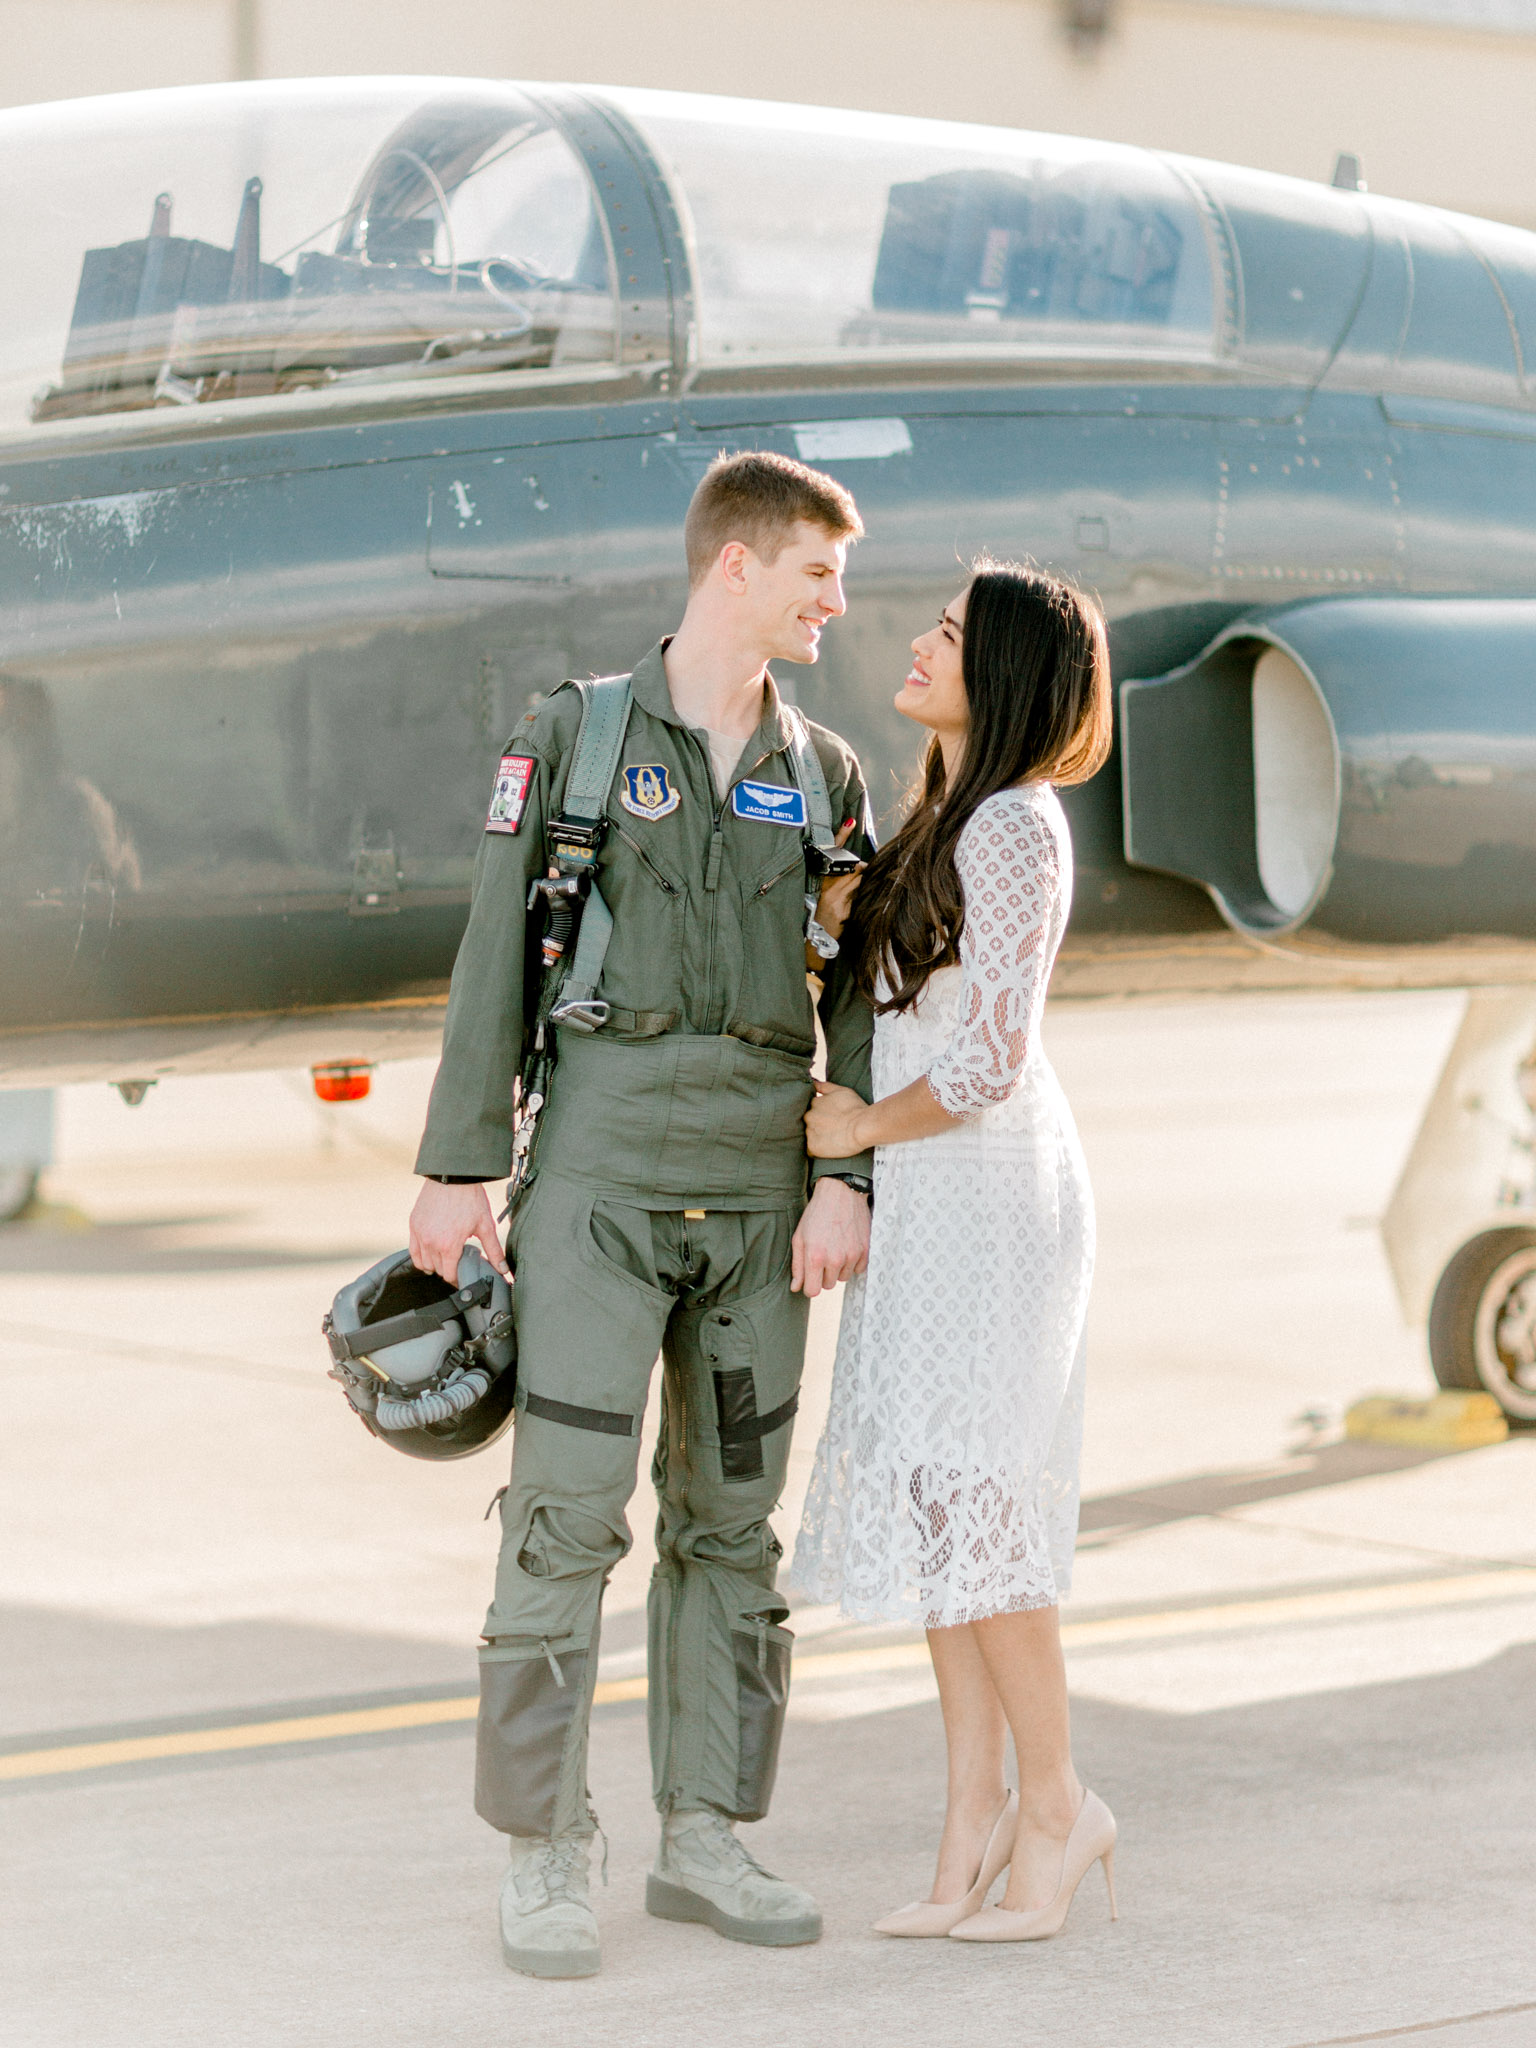 Sheppard Air Force Base Engagement Photos - Elegant Photography